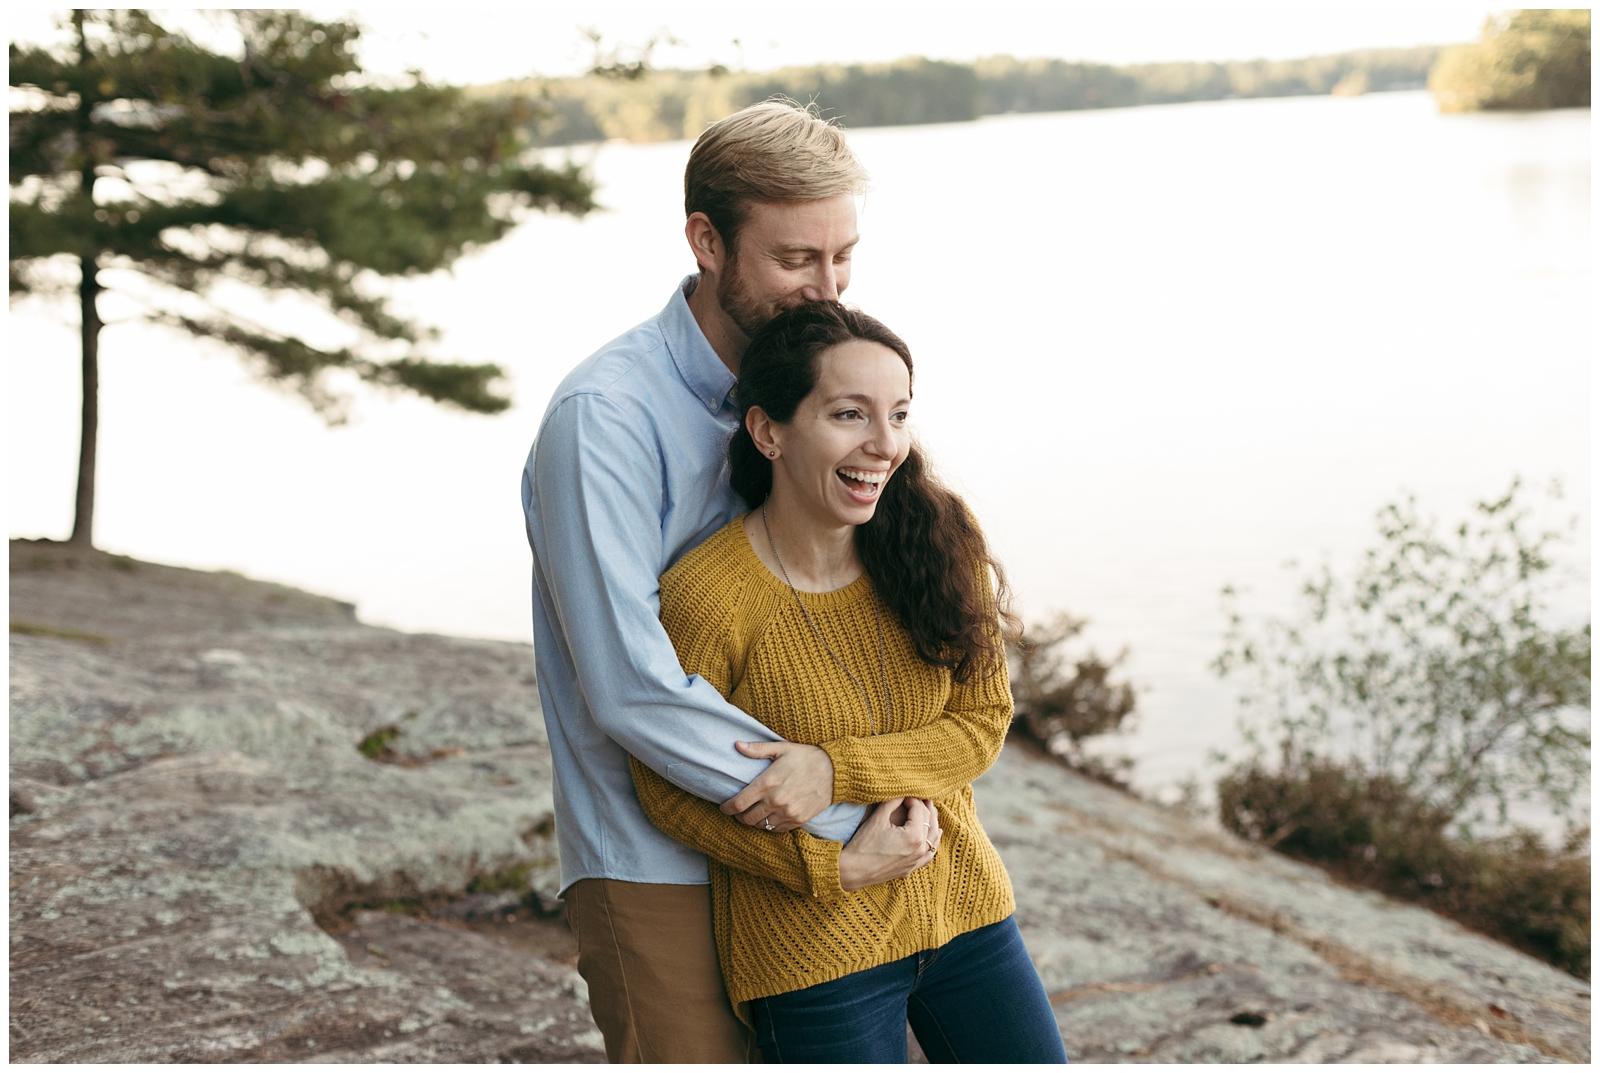 Connecticut-Engagement-Photographer-Bailey-Q-Photo-20.jpg